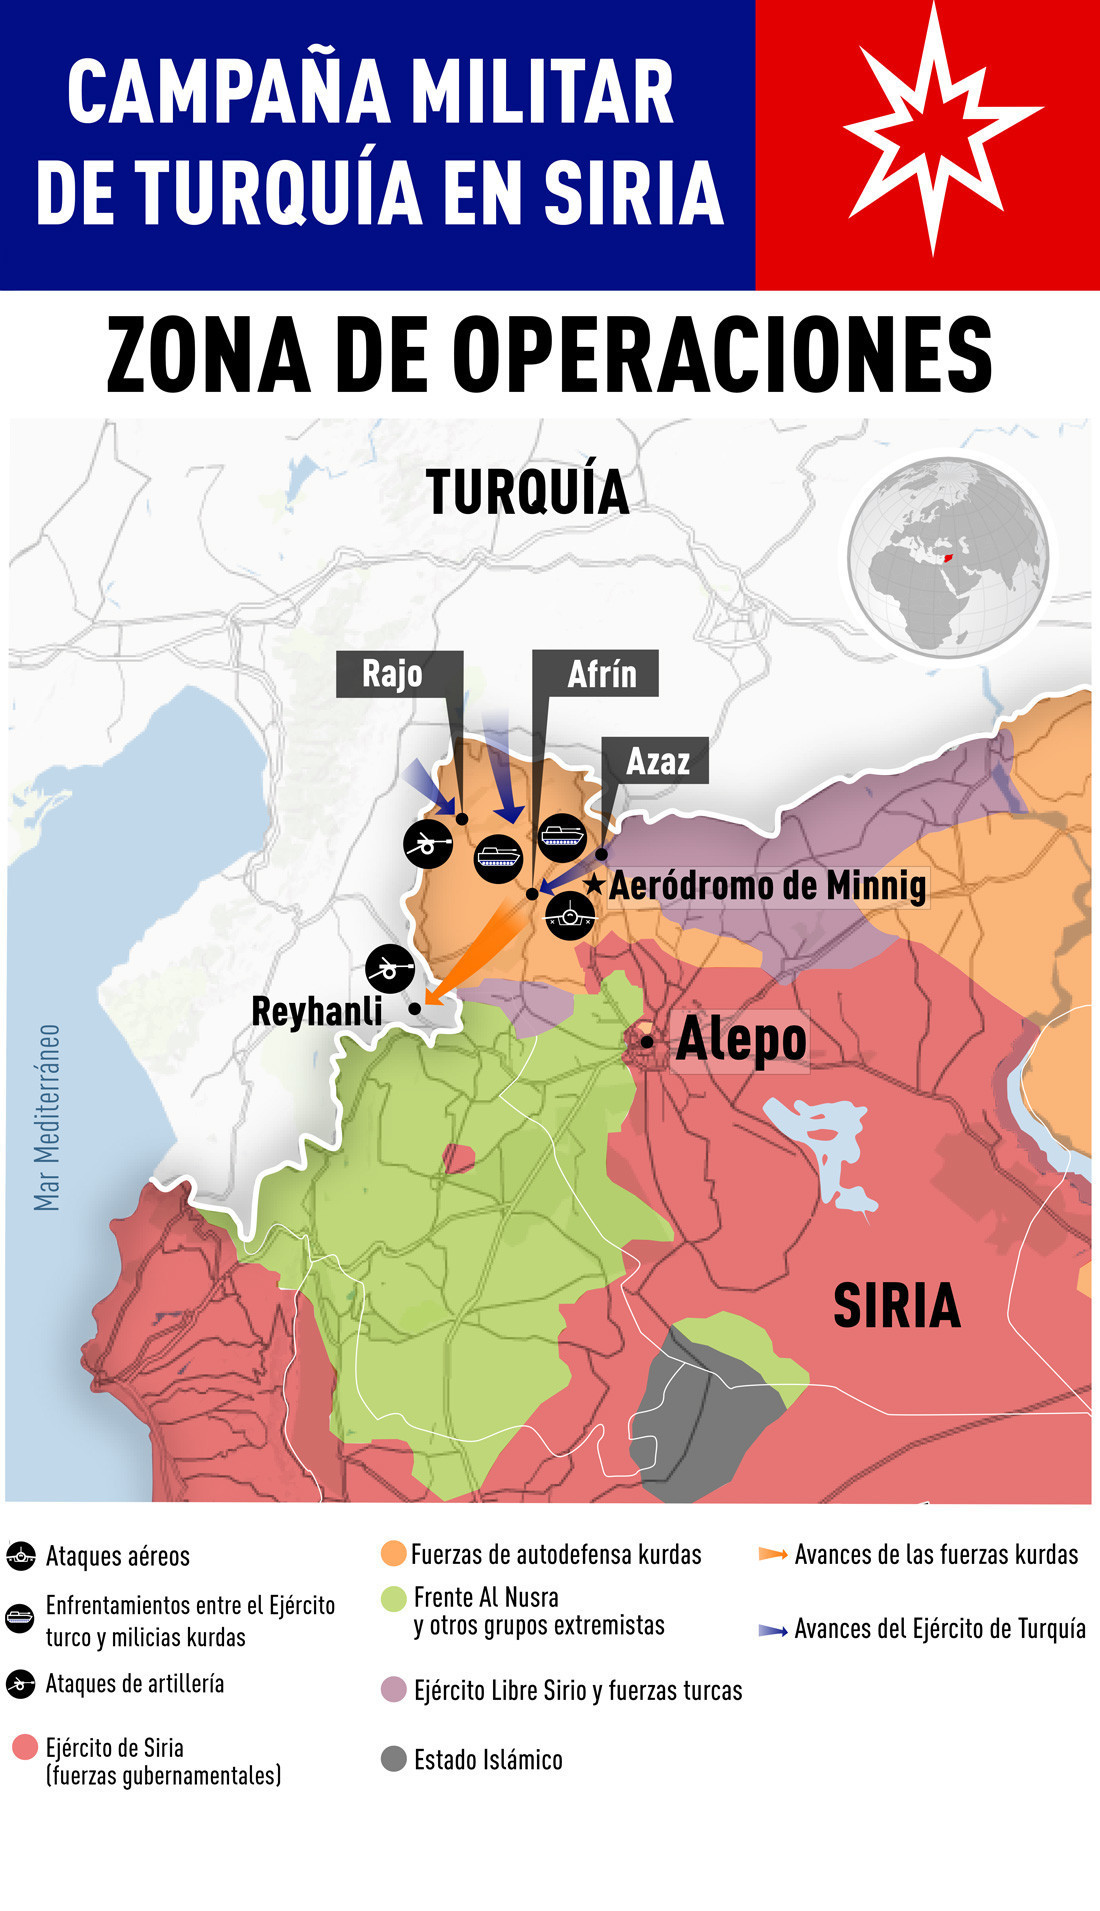 Conflicto Turquía - Siria  - Página 14 5a70505b08f3d99f158b4567